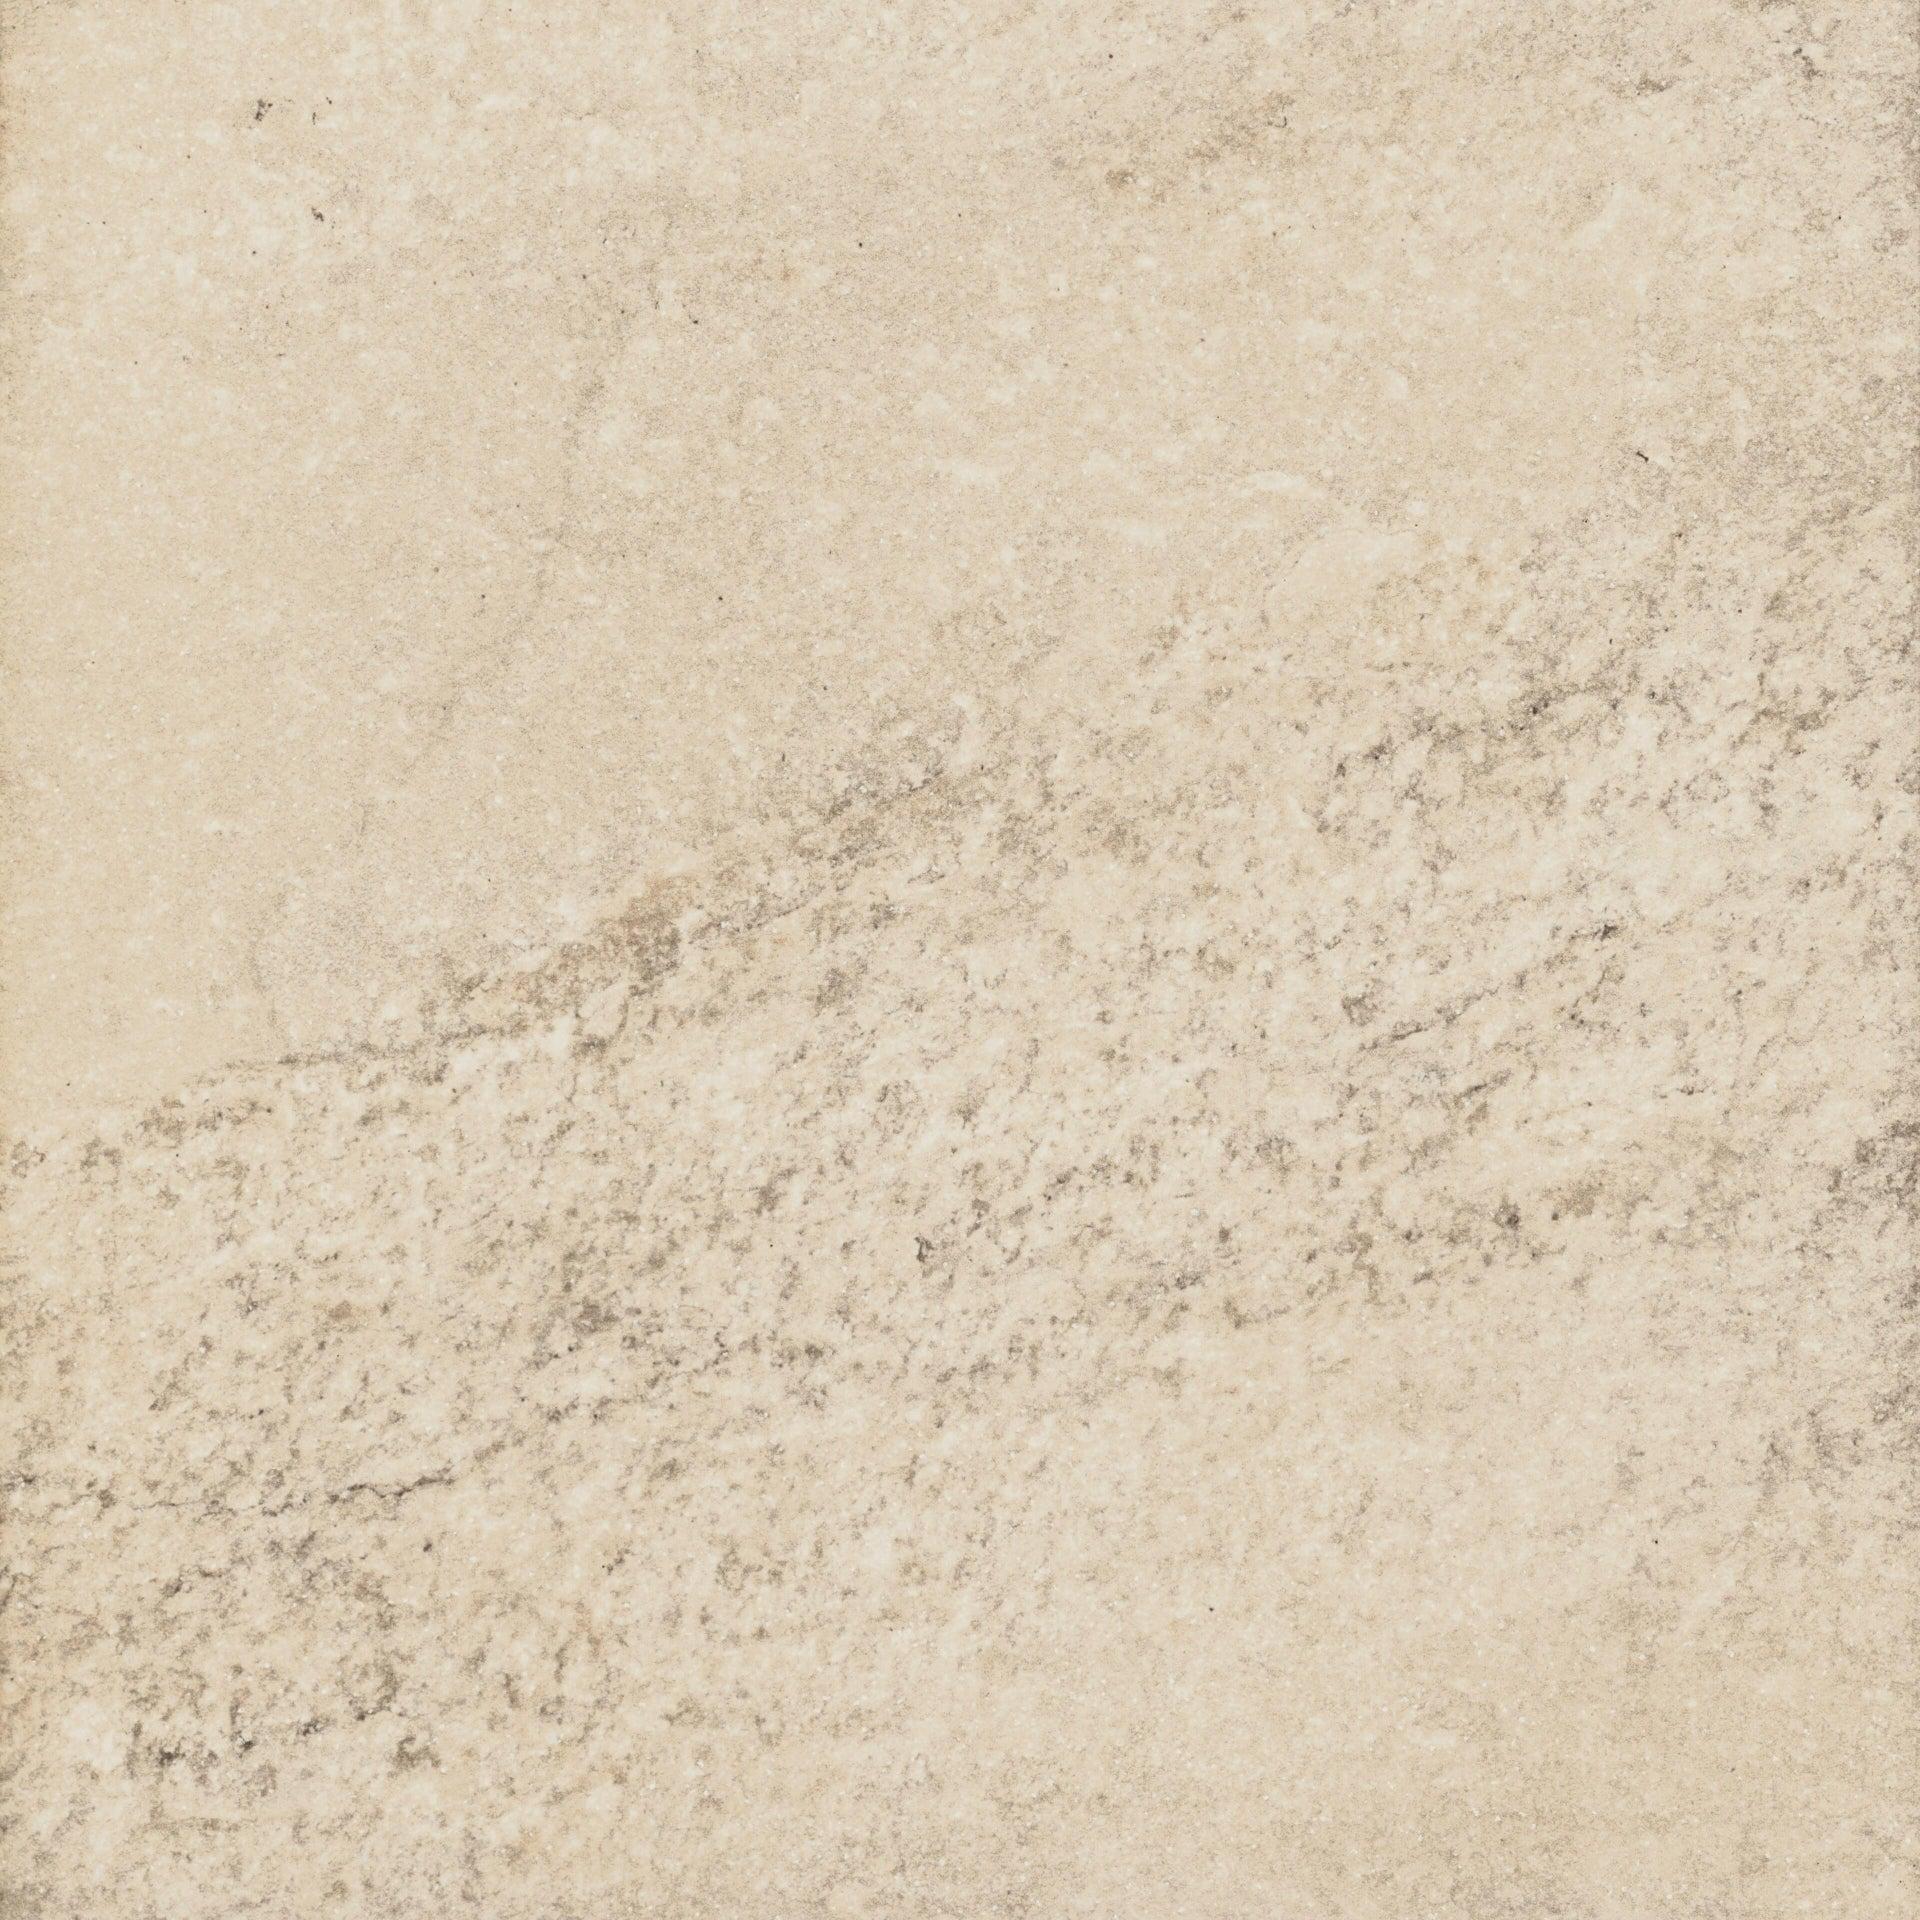 Piastrella da pavimento Walk 32.5 x 32.5 cm sp. 9 mm PEI 3/5 beige - 3